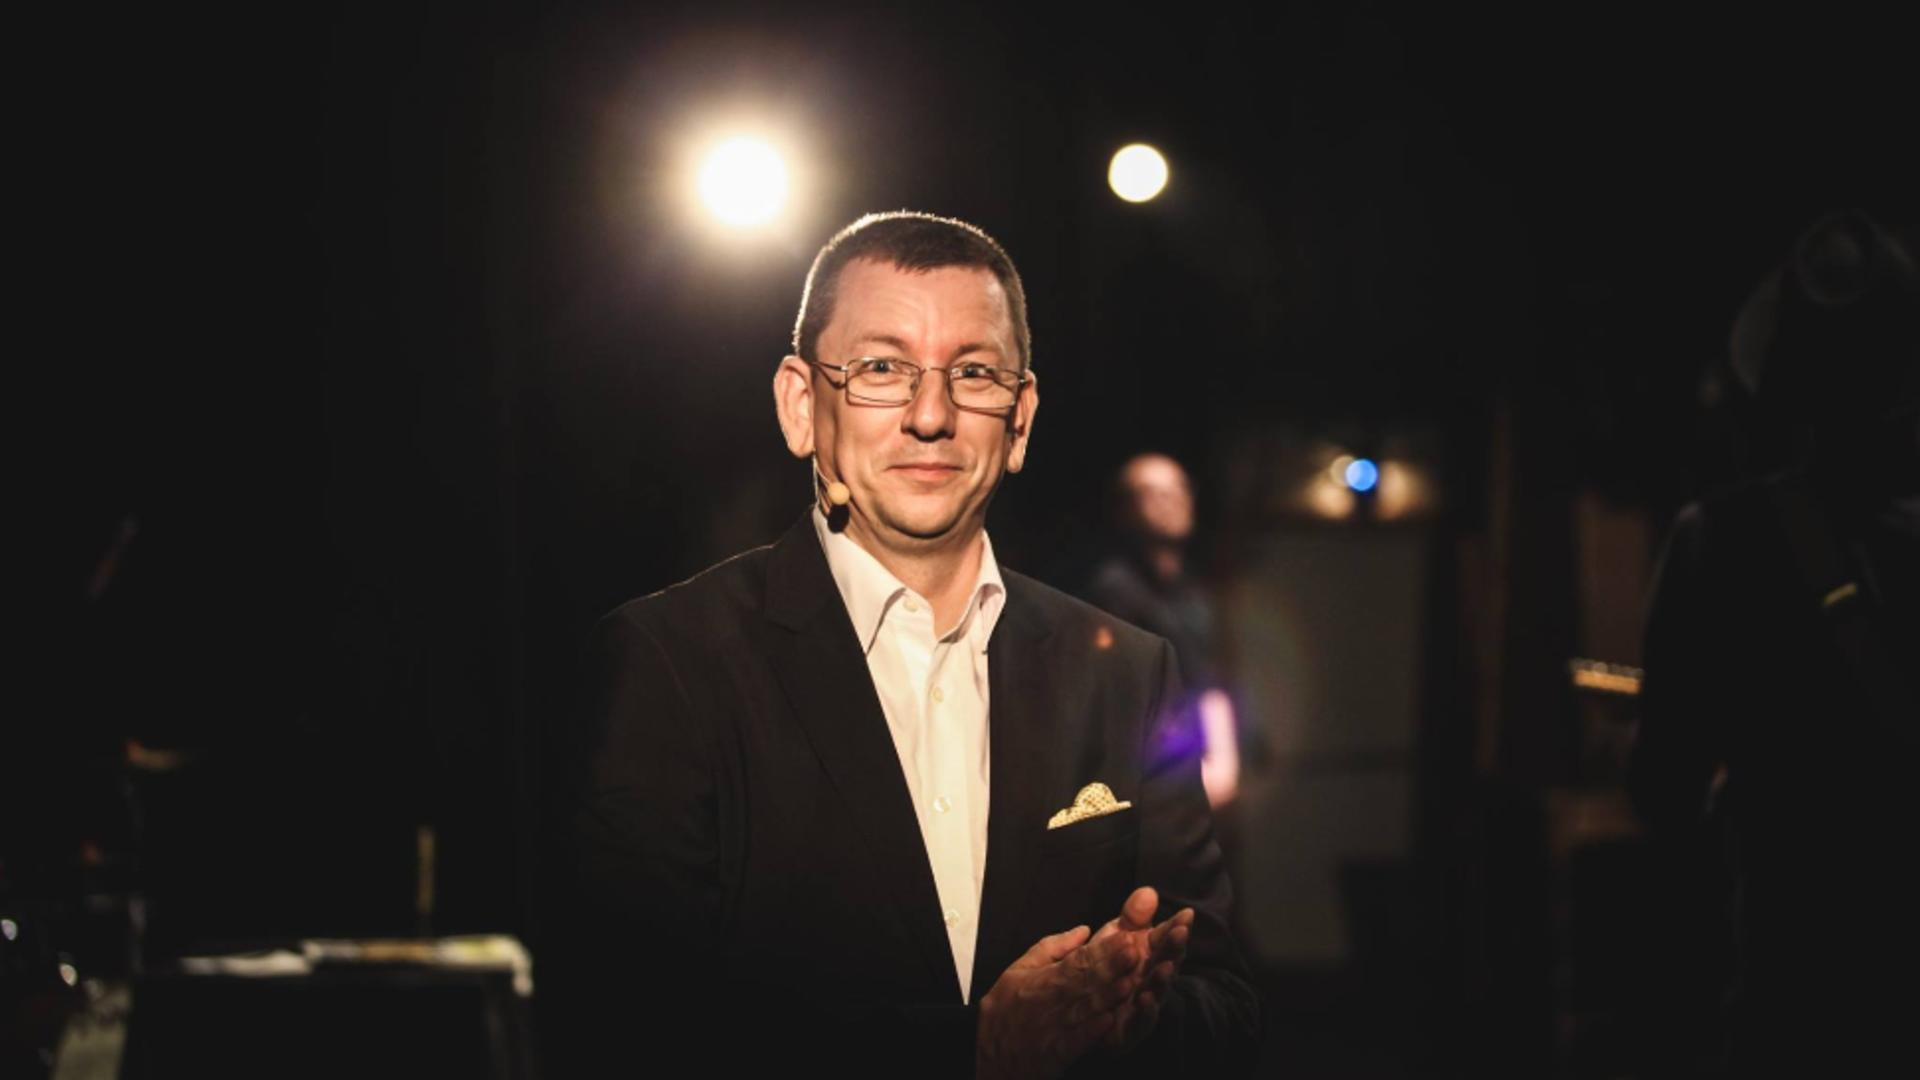 Dragoș Boța, jurnalist / Foto: Facebook